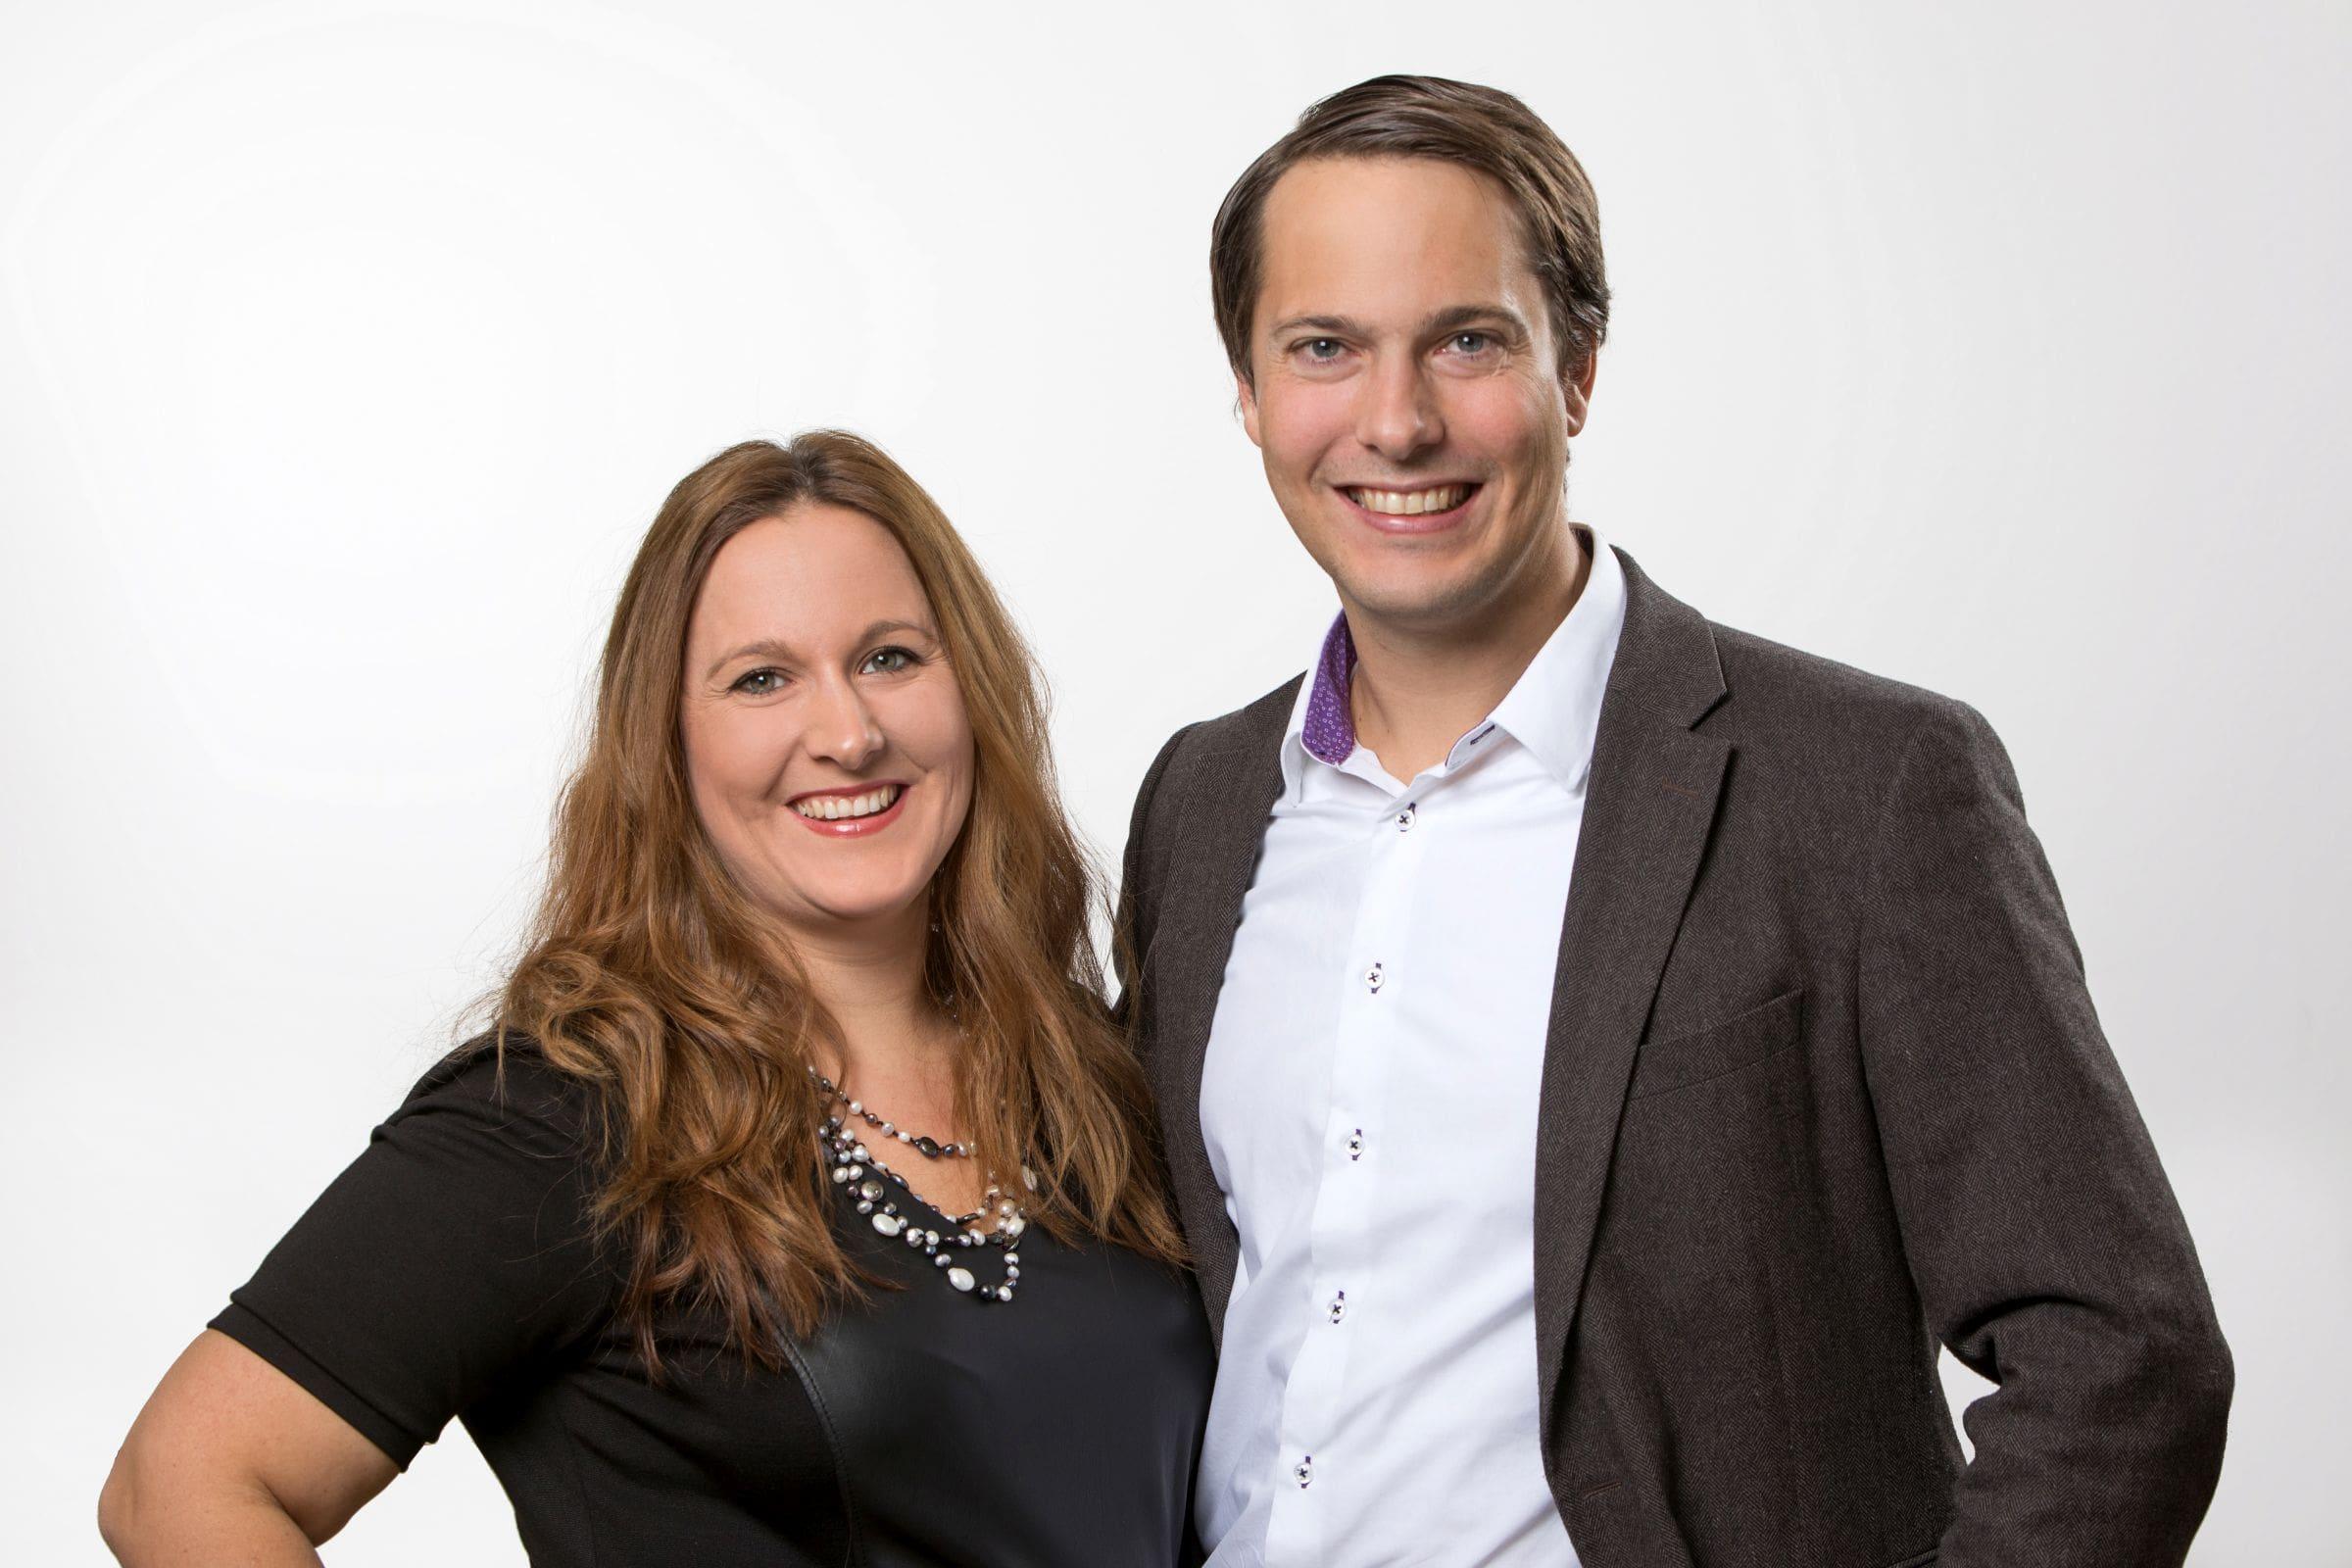 Mag. Eva Hausegger & Mag. (FH) Stefan Gassner